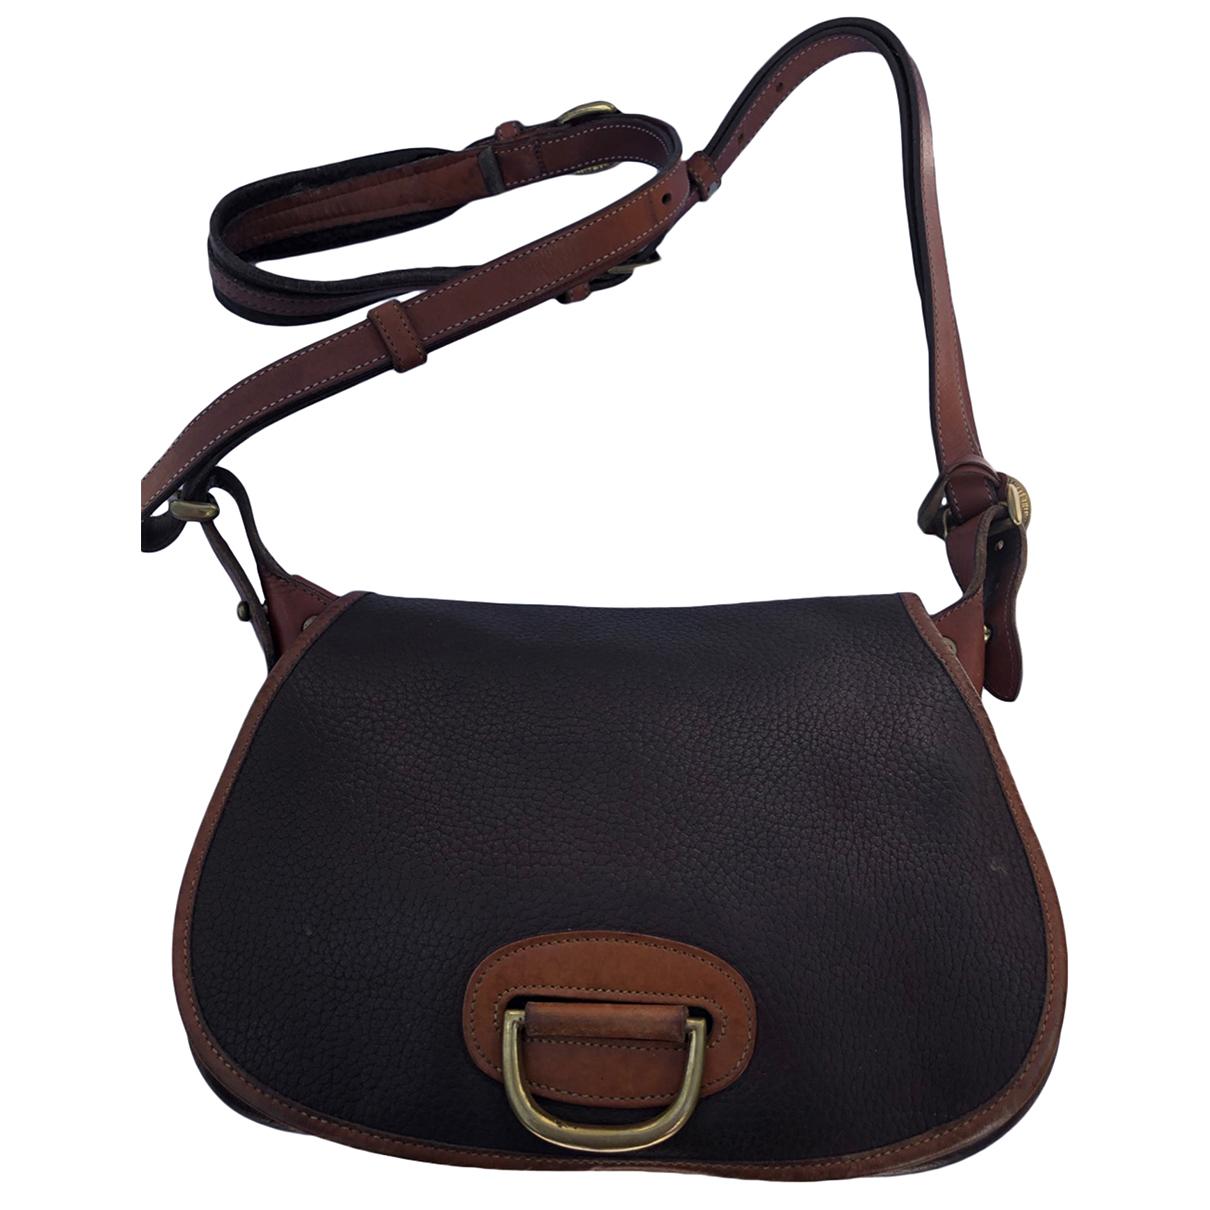 Dooney And Bourke \N Brown Leather handbag for Women \N